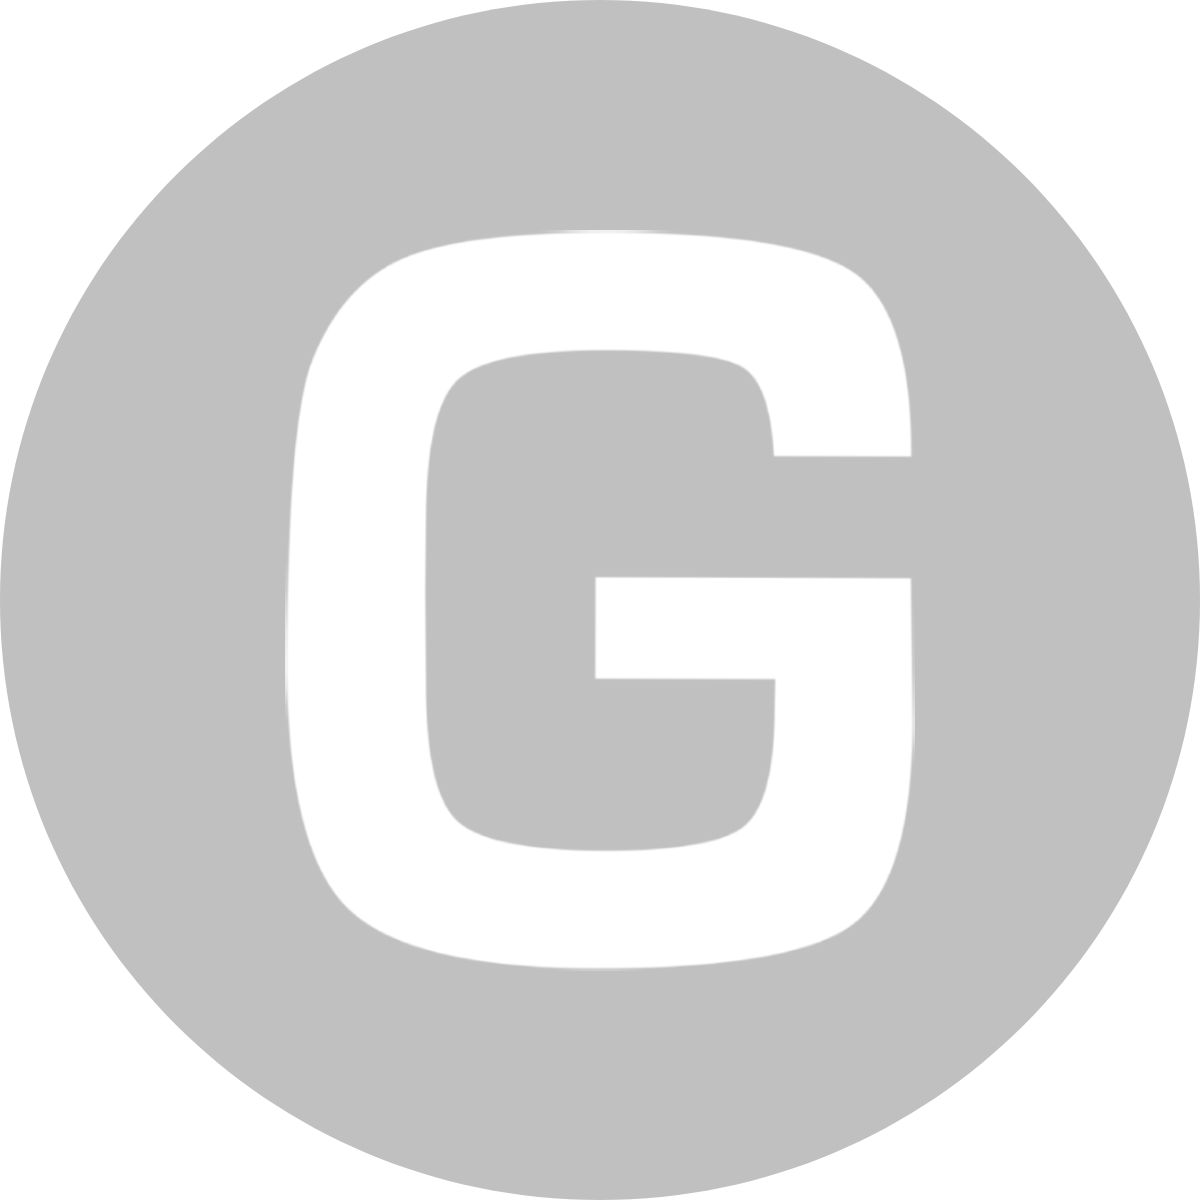 Adidas Sko Tour360 XT-SL Textile Grå/Hvit/Gul Herre